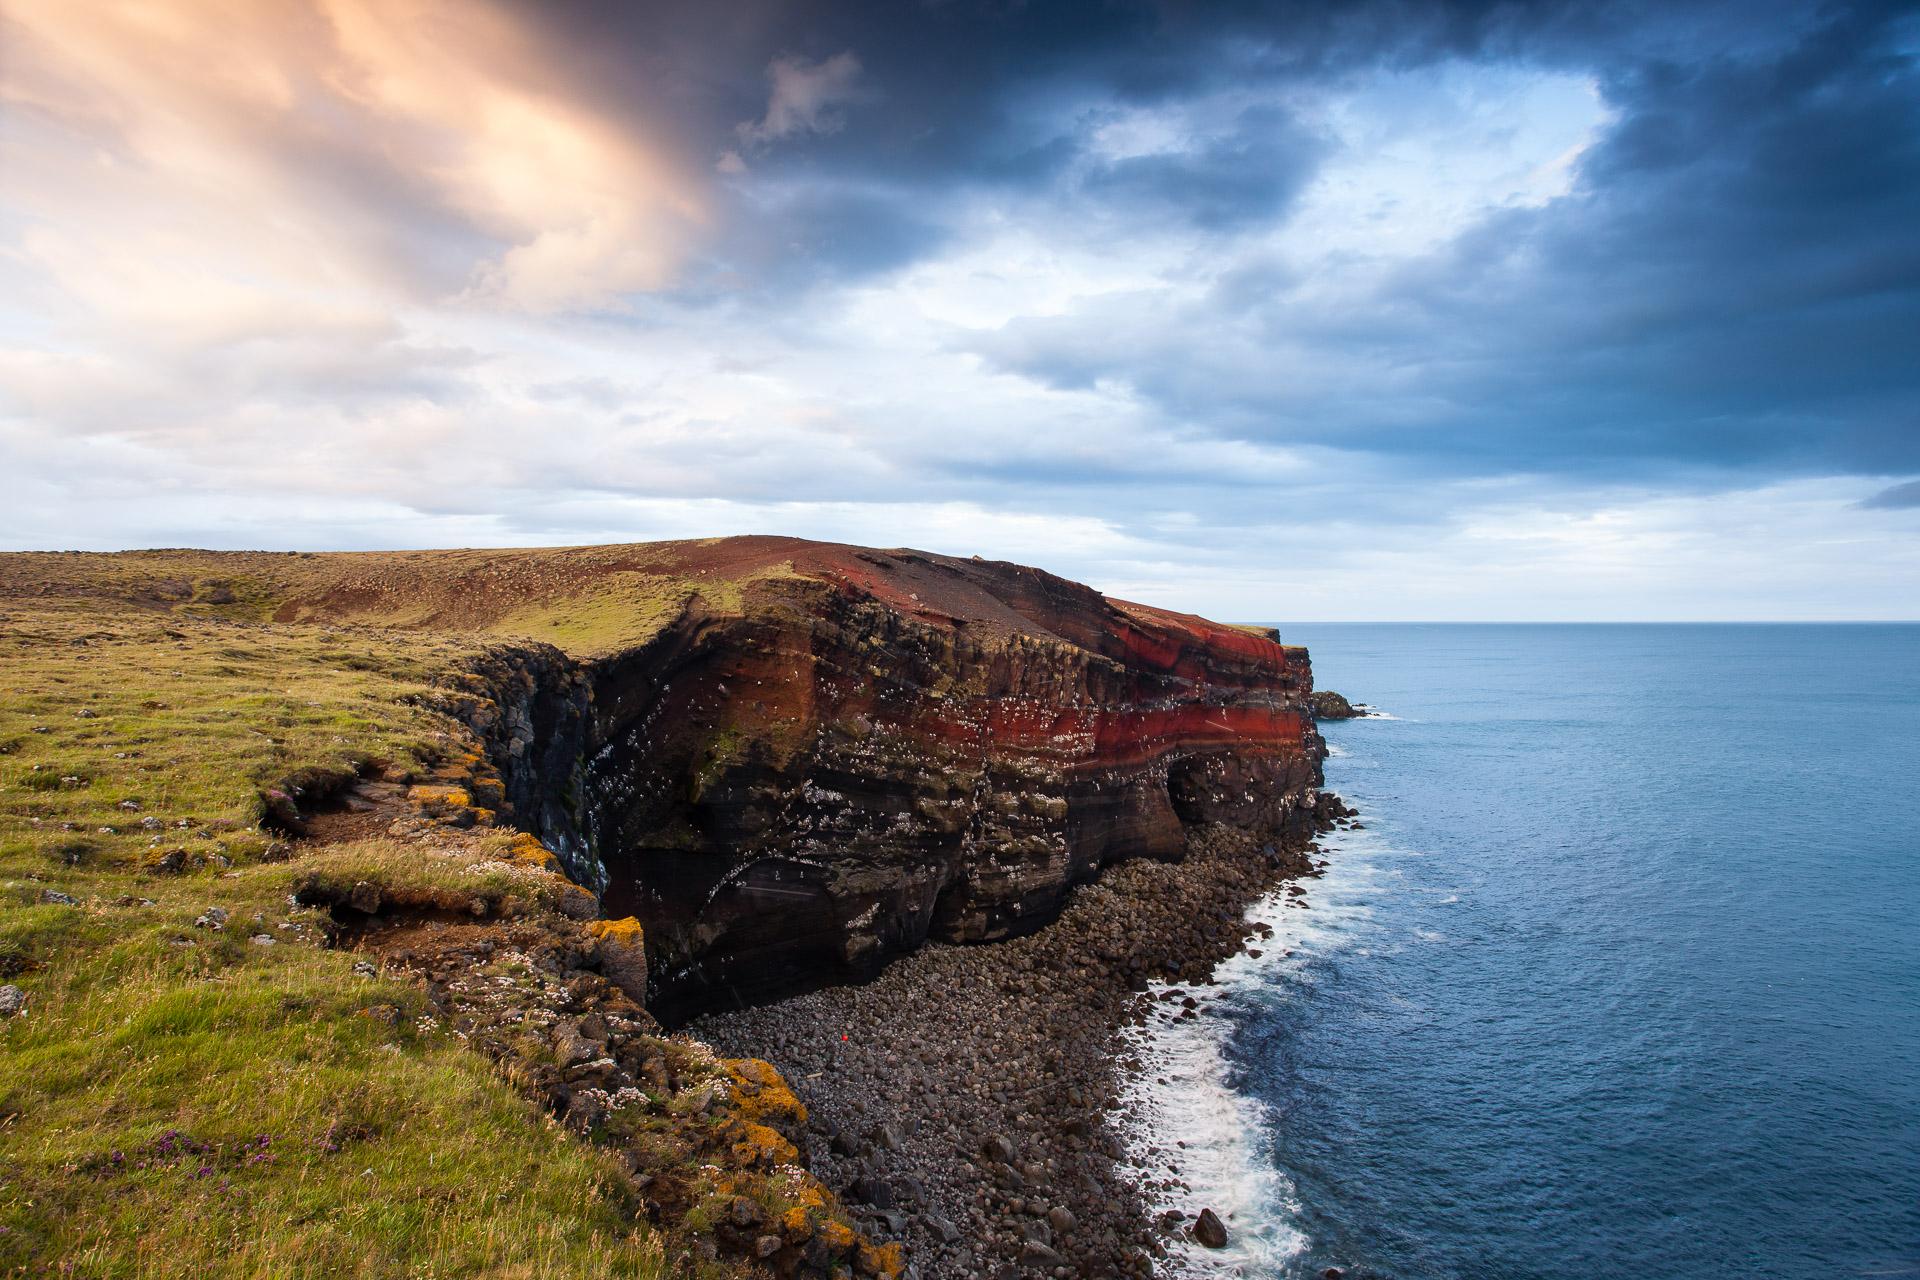 Côte de la péninsule de Reykjanes, en islande